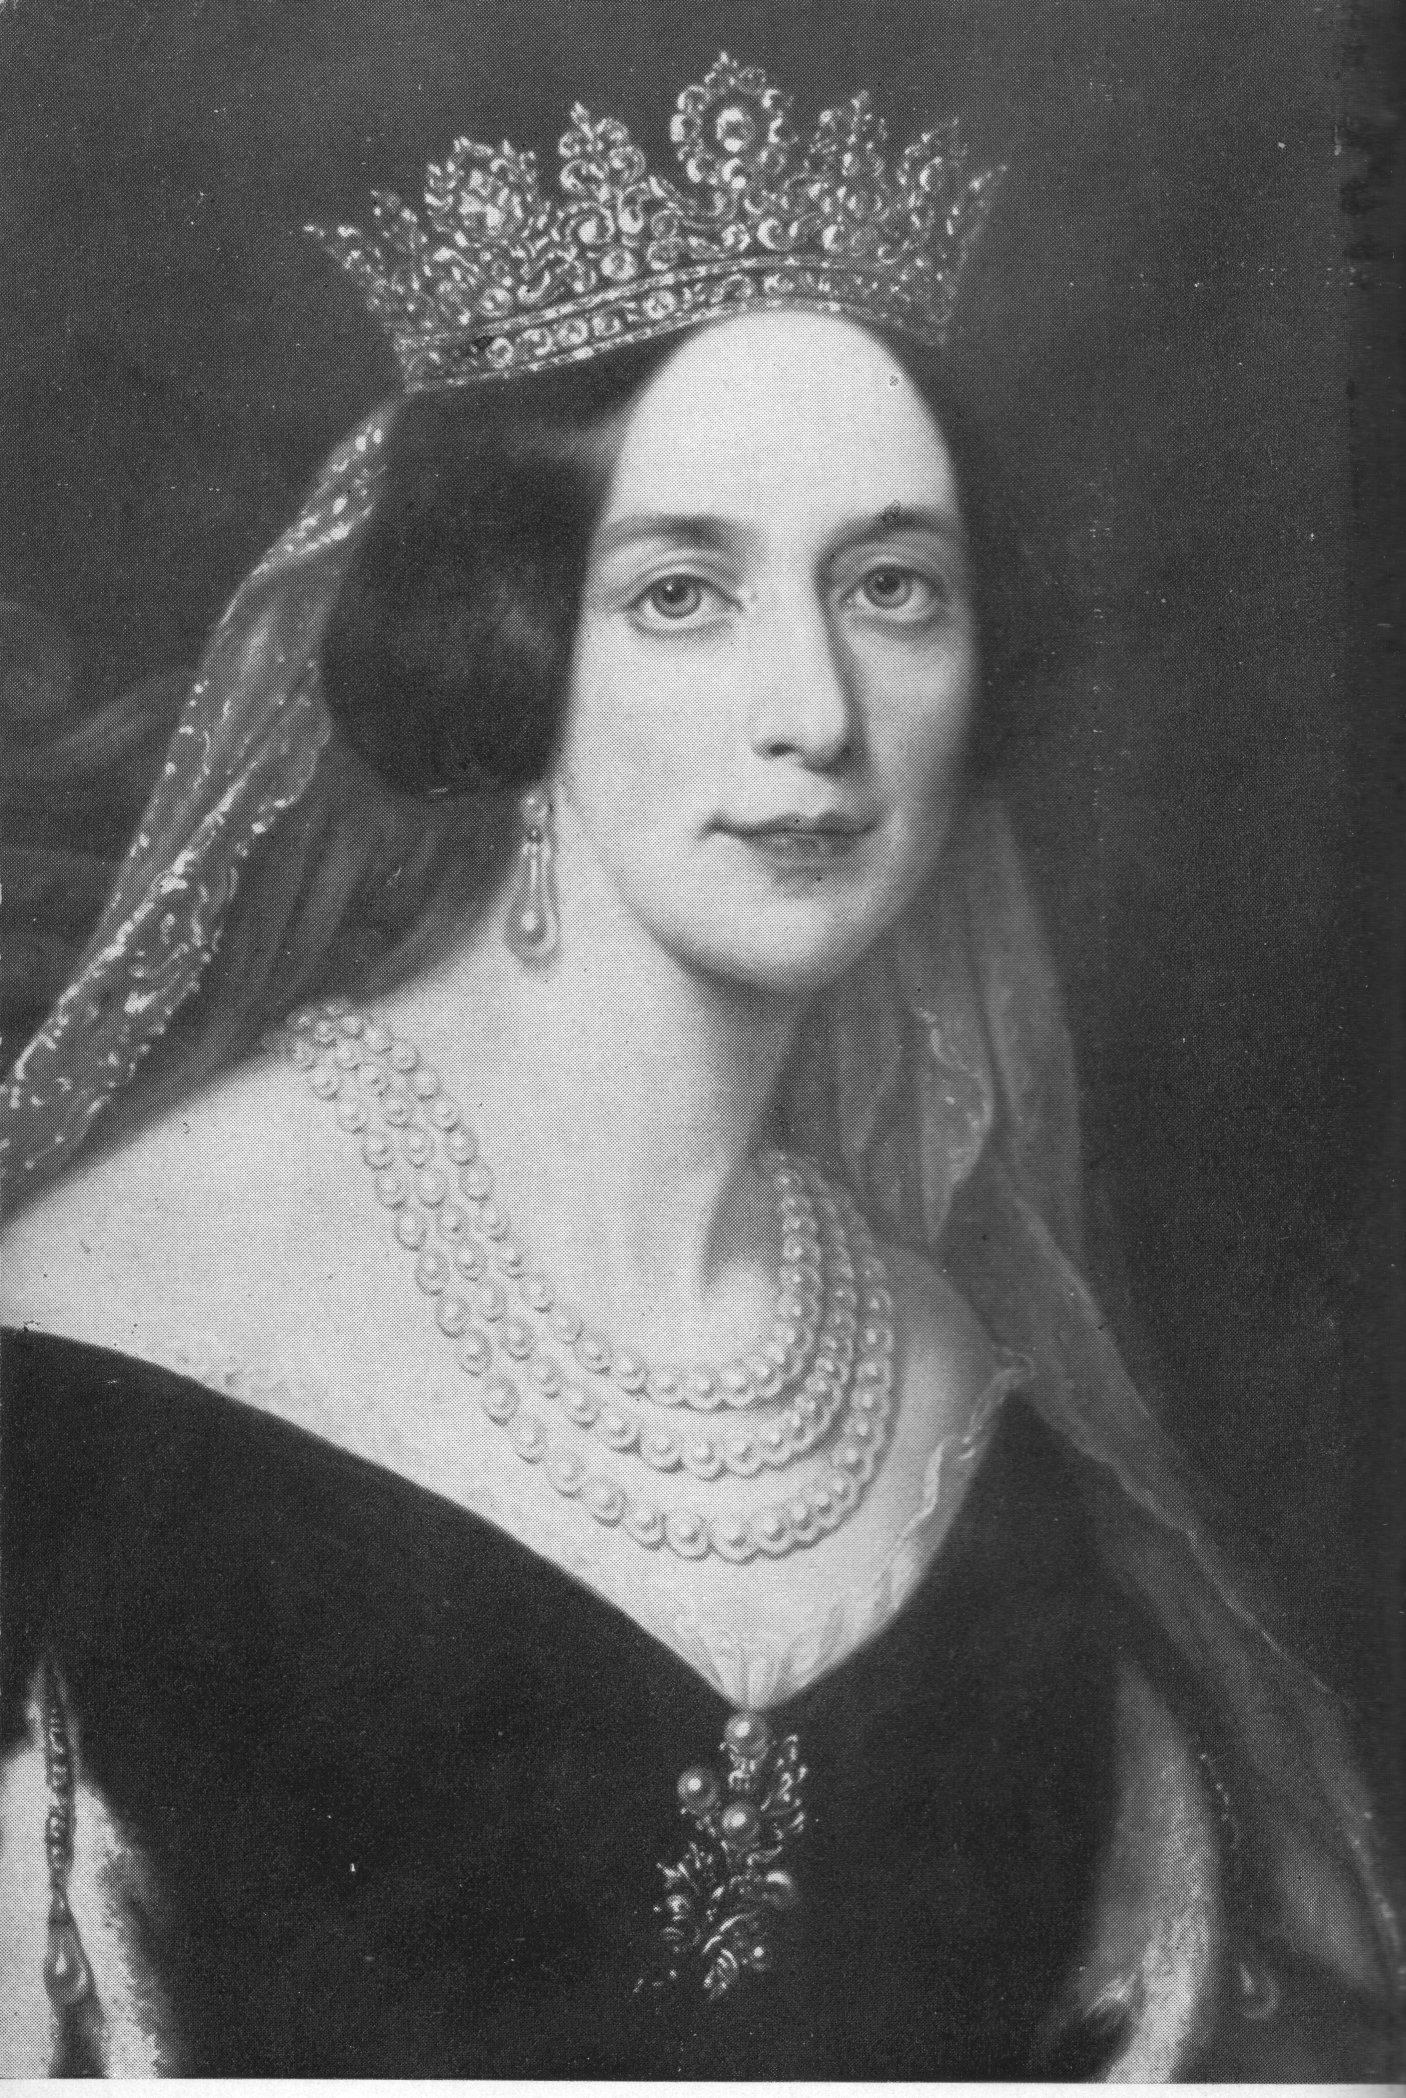 Joséphine de Beauharnais mladší - Wikiwand Josephine